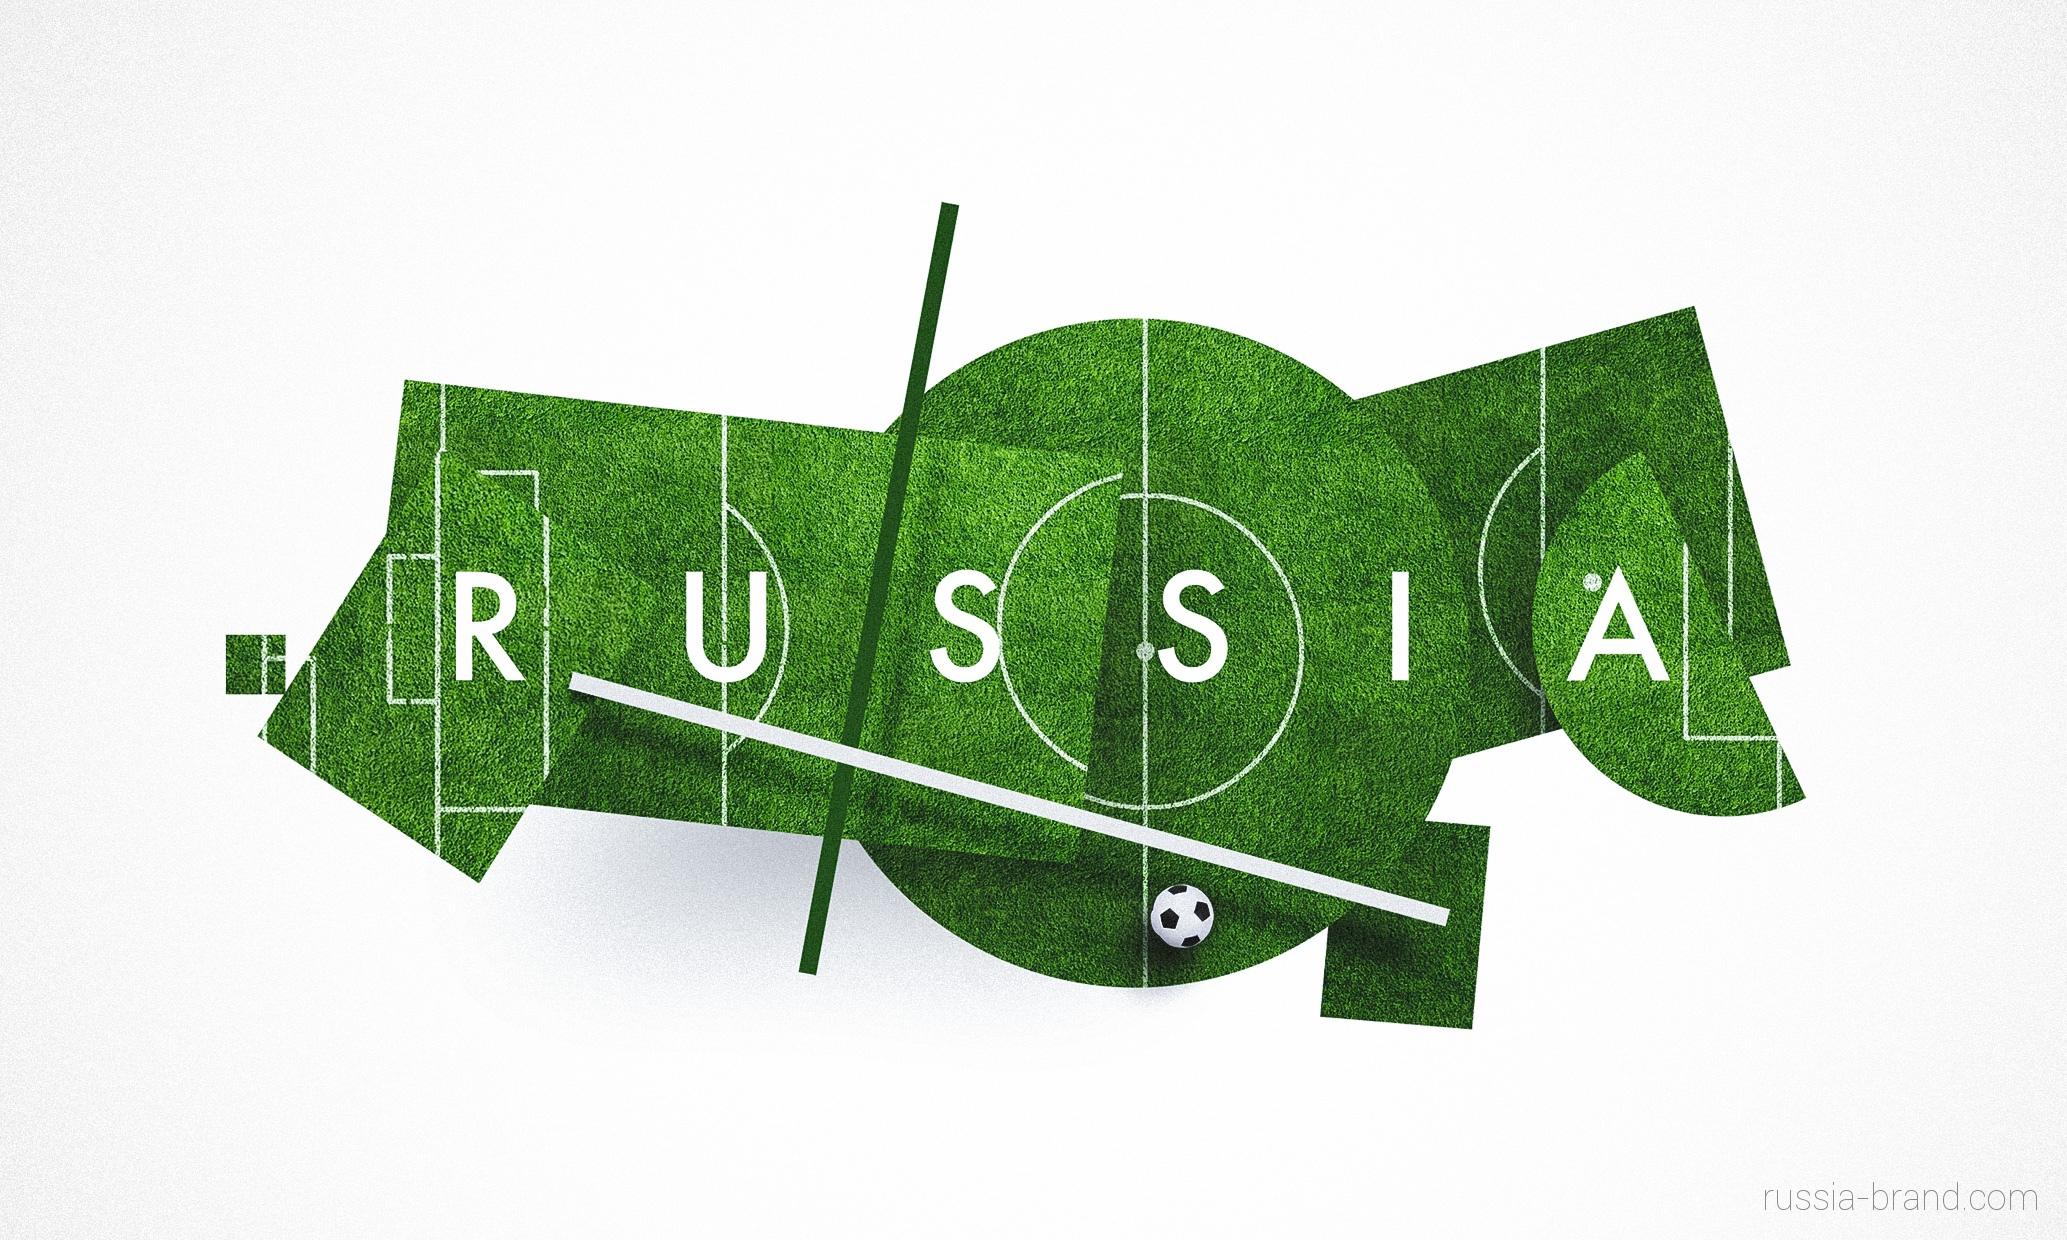 russia-brand4.jpg